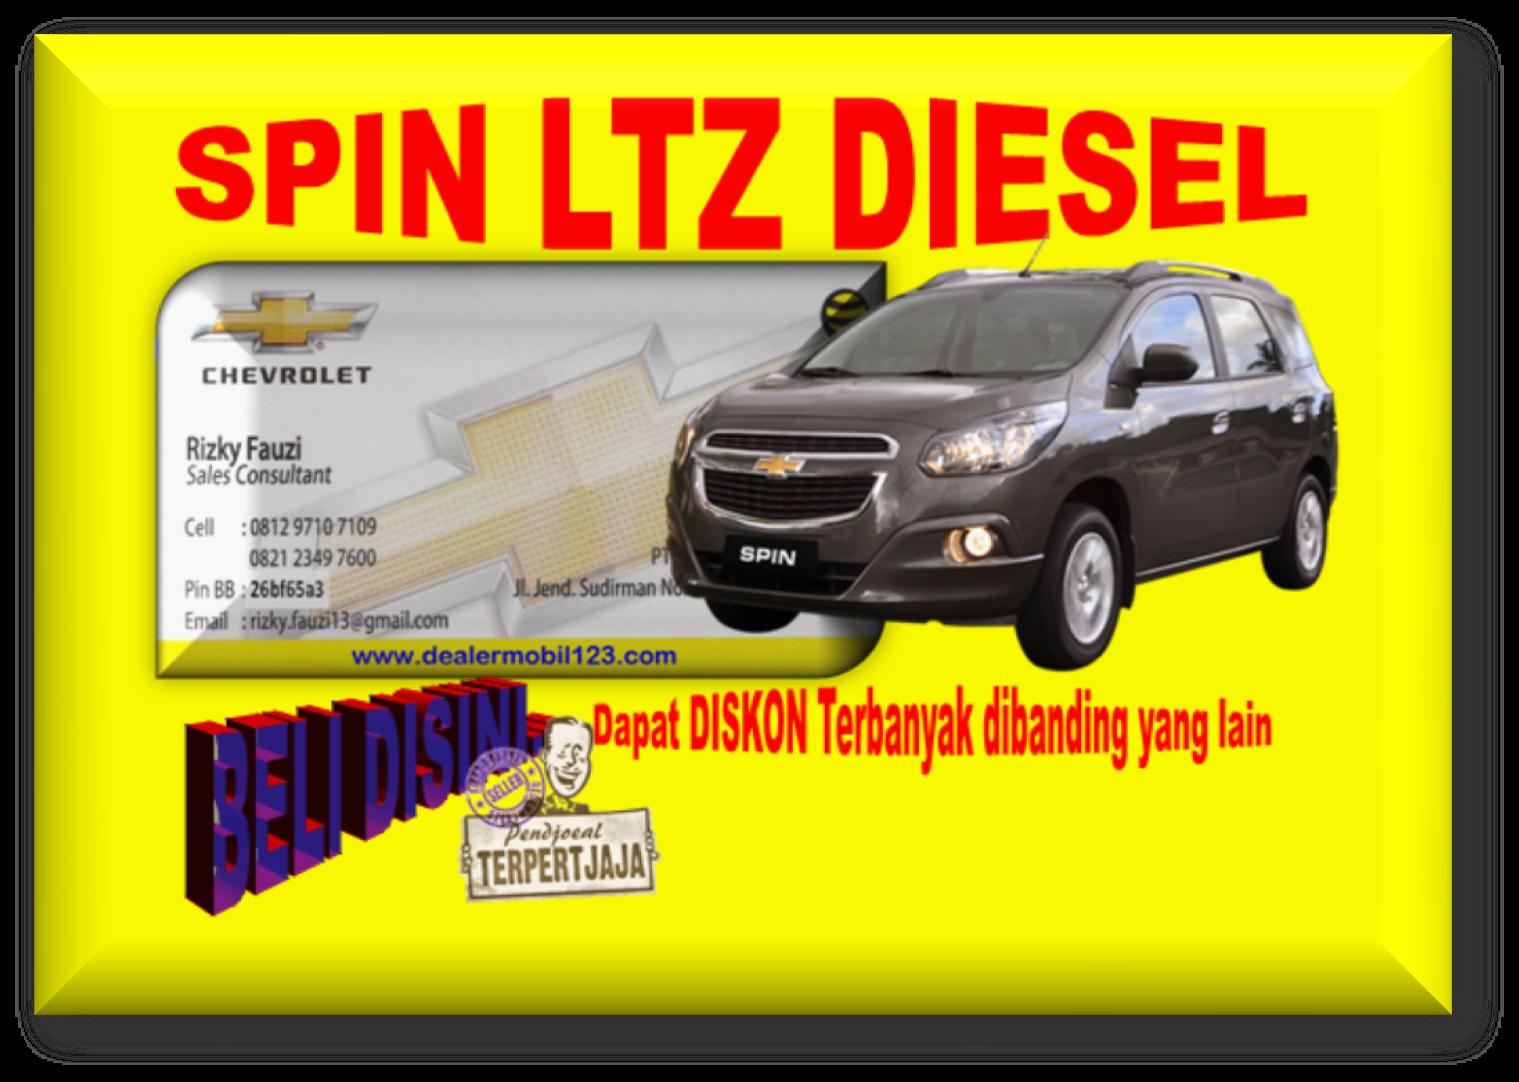 Spin LTZ Diesel Diskon Terbanyak 0812 9710 7109